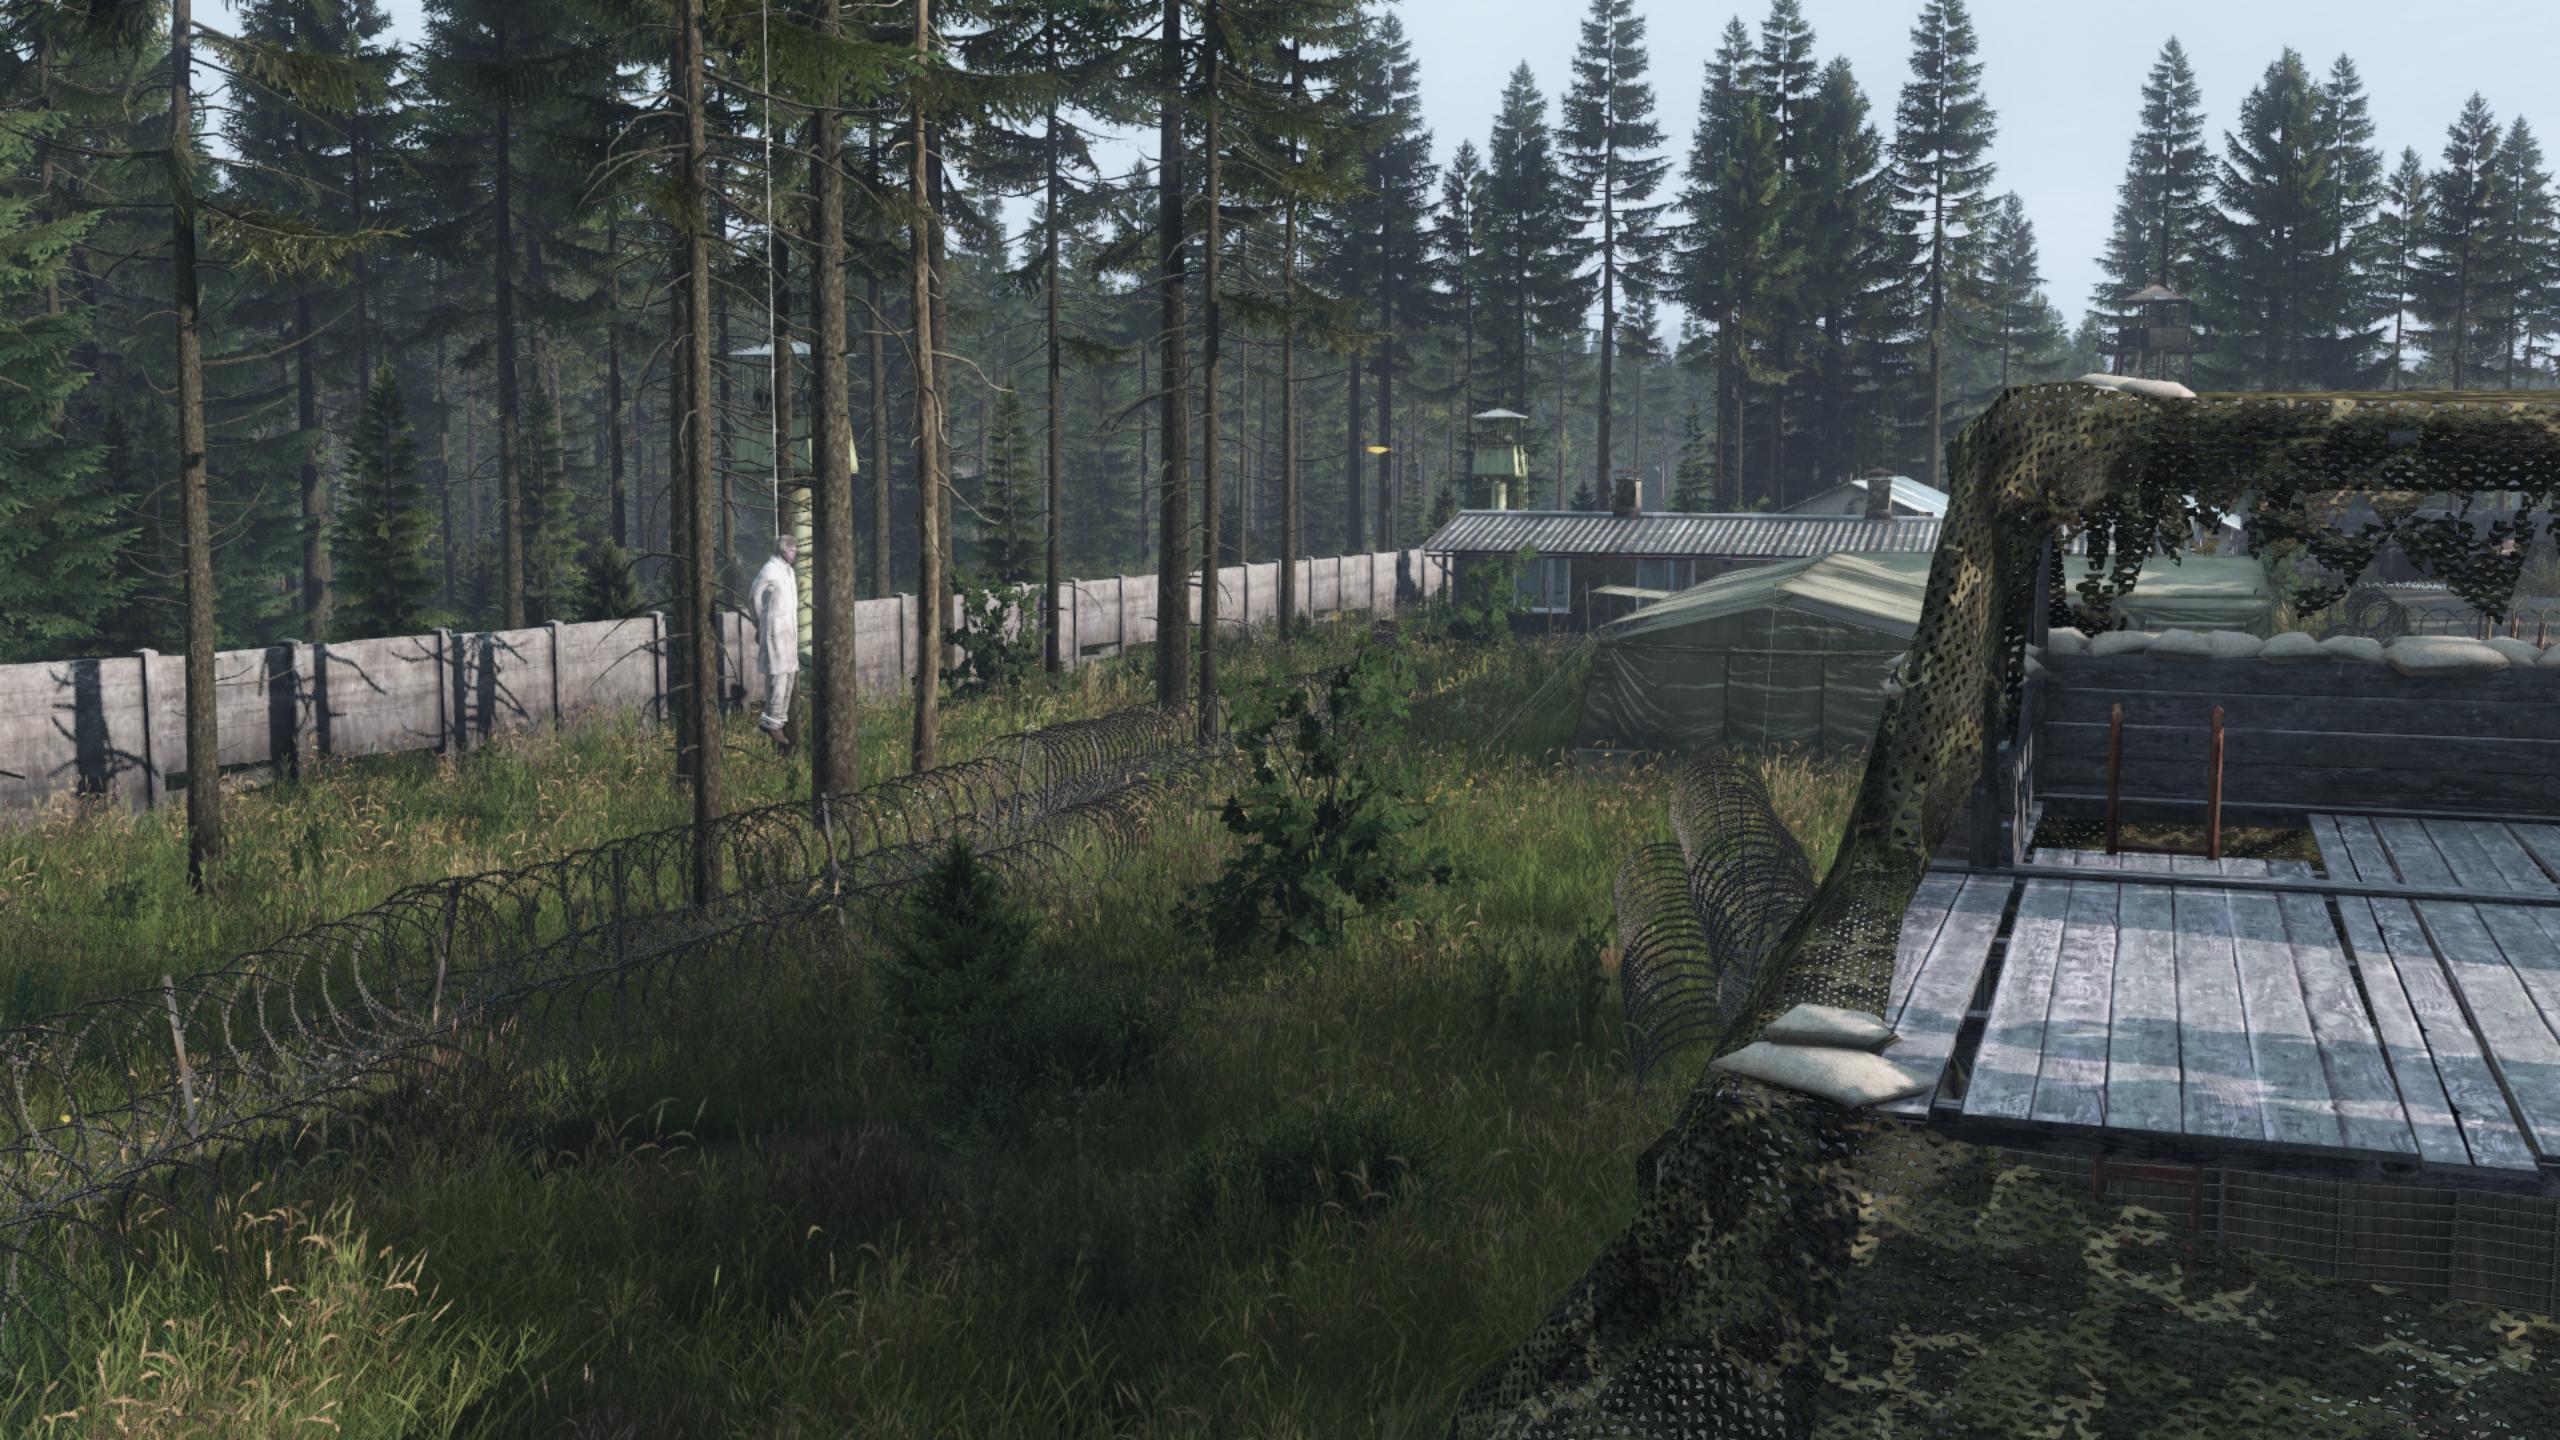 Rgm-dayz-server-rostowmap